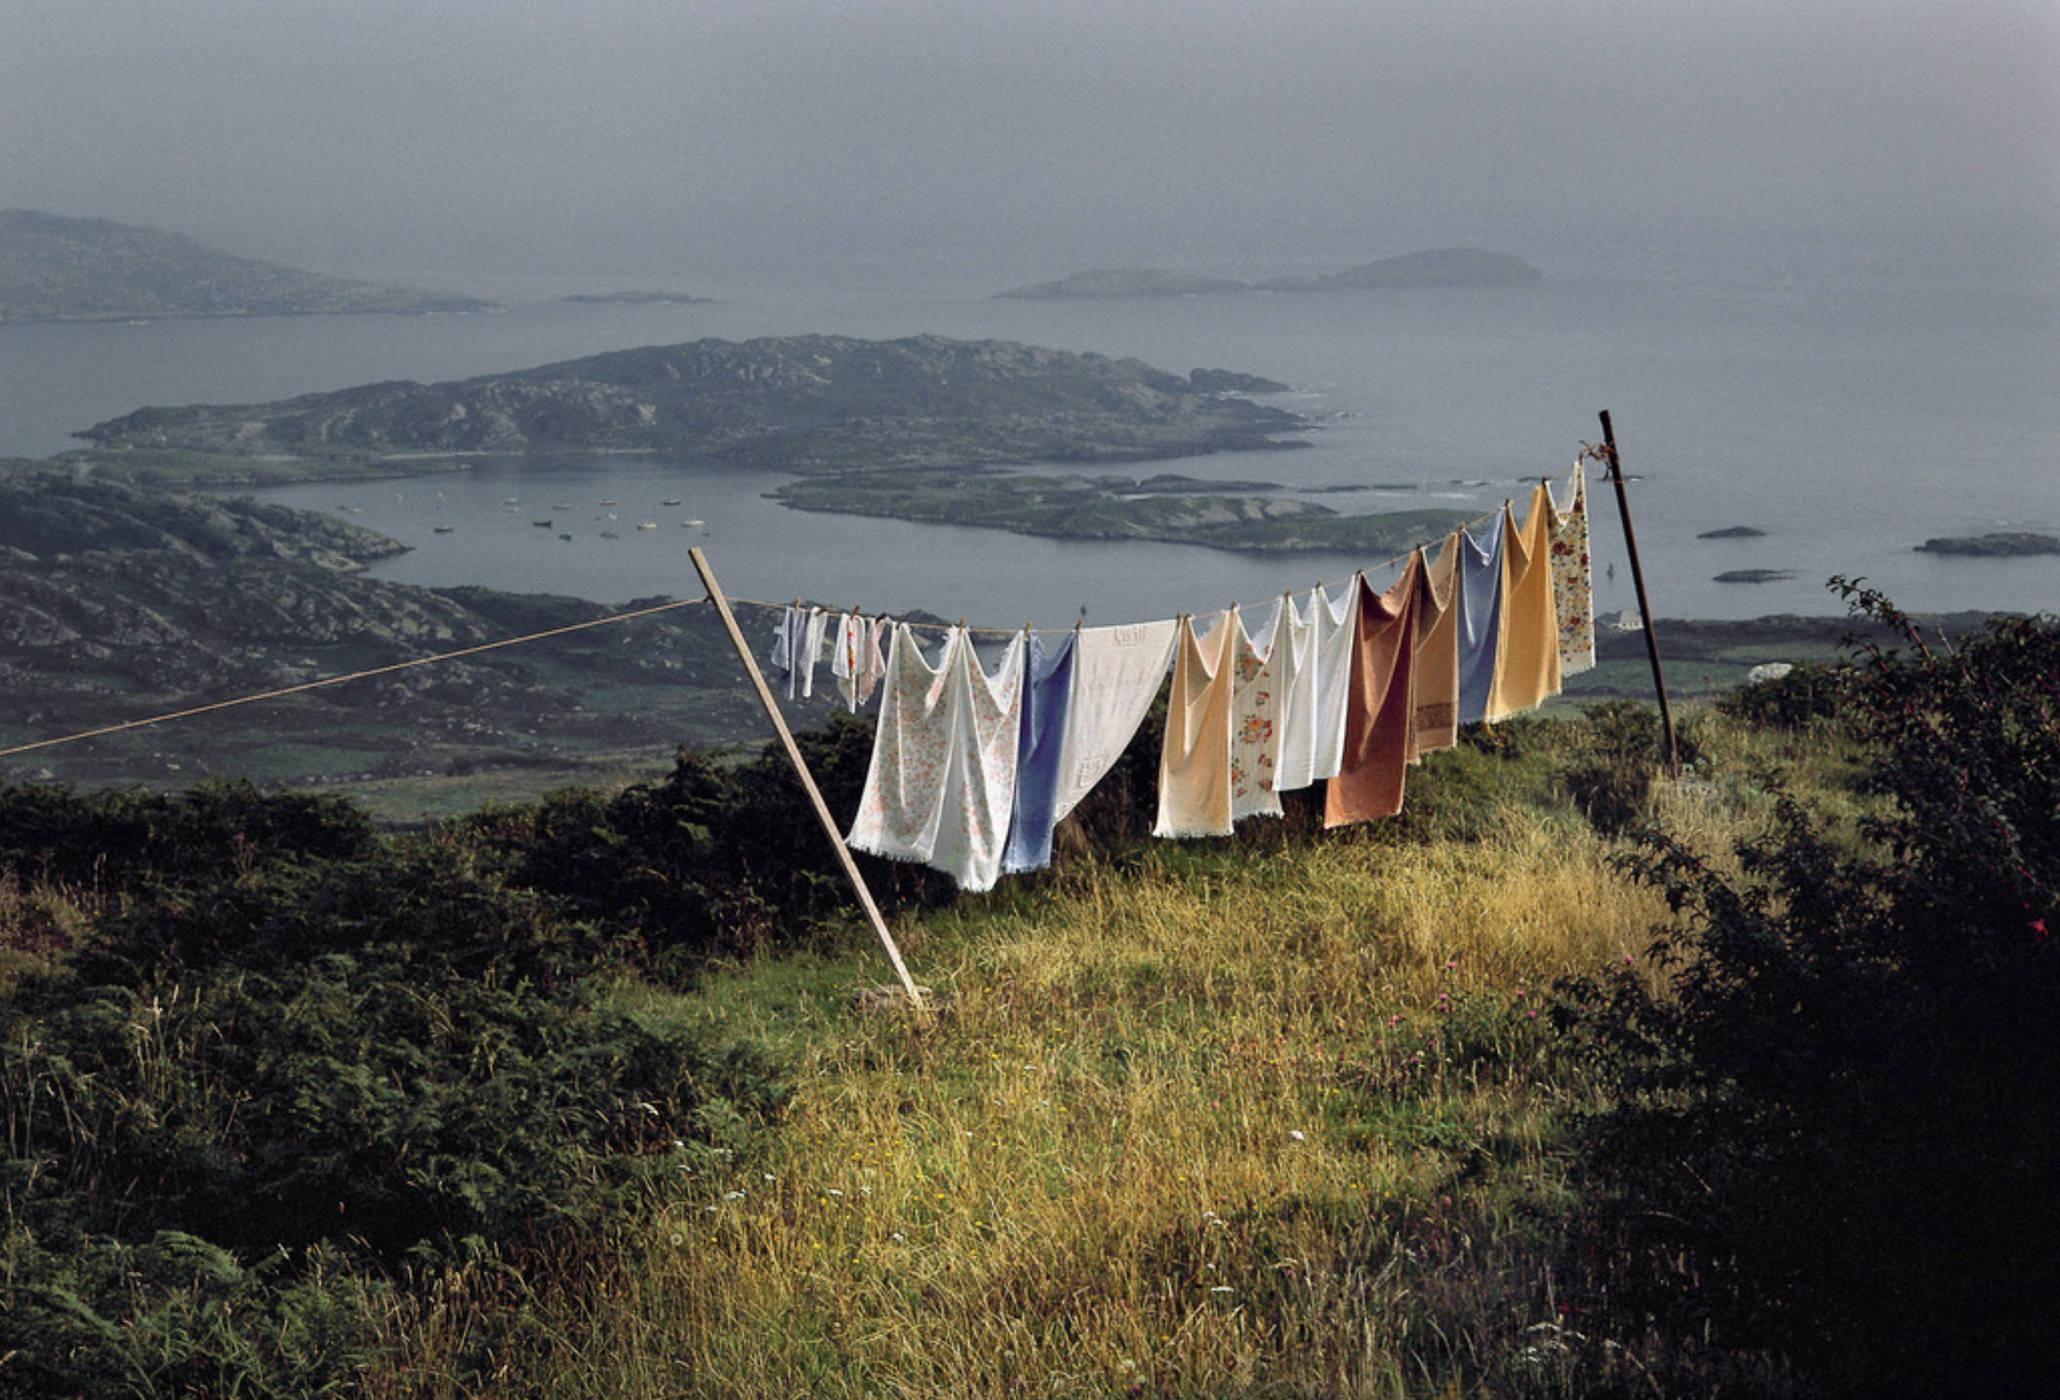 Photographie Kodachrome Harry Gruyaert Irlande Côte Ouest Comte Kerry 1988